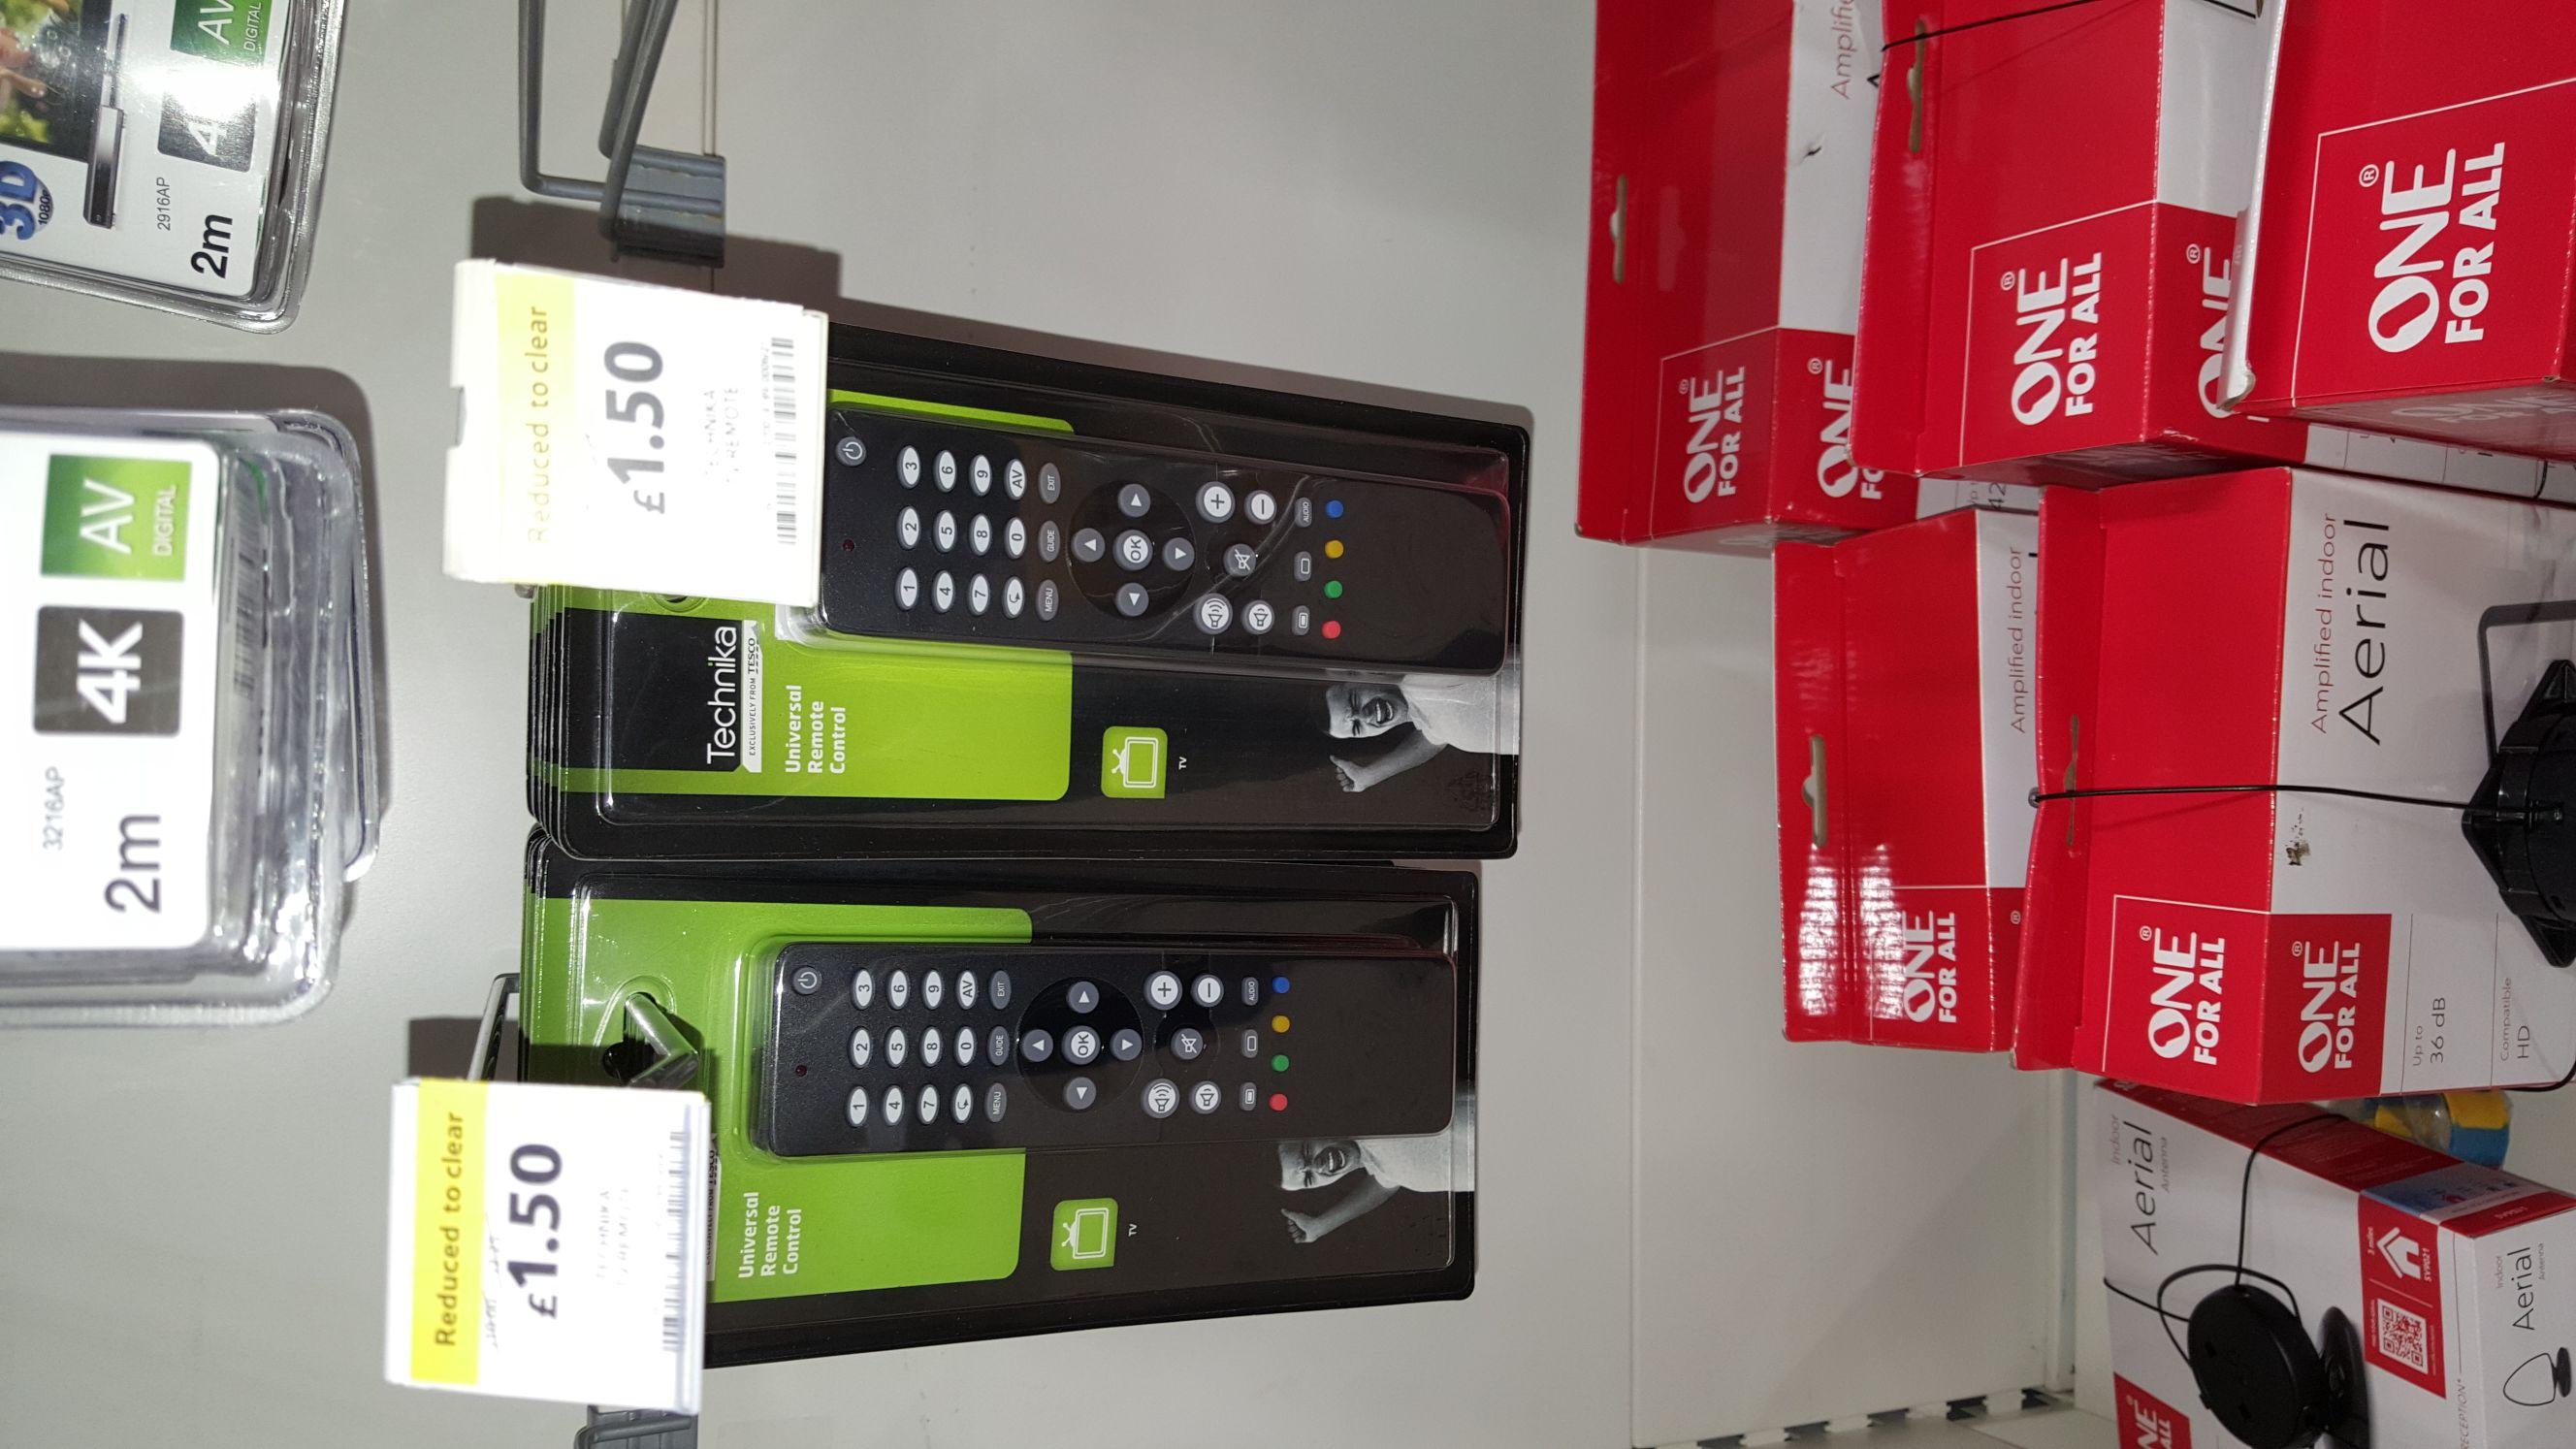 Technika Universal Remote Control £1.50 @ Tesco Rawtenstall